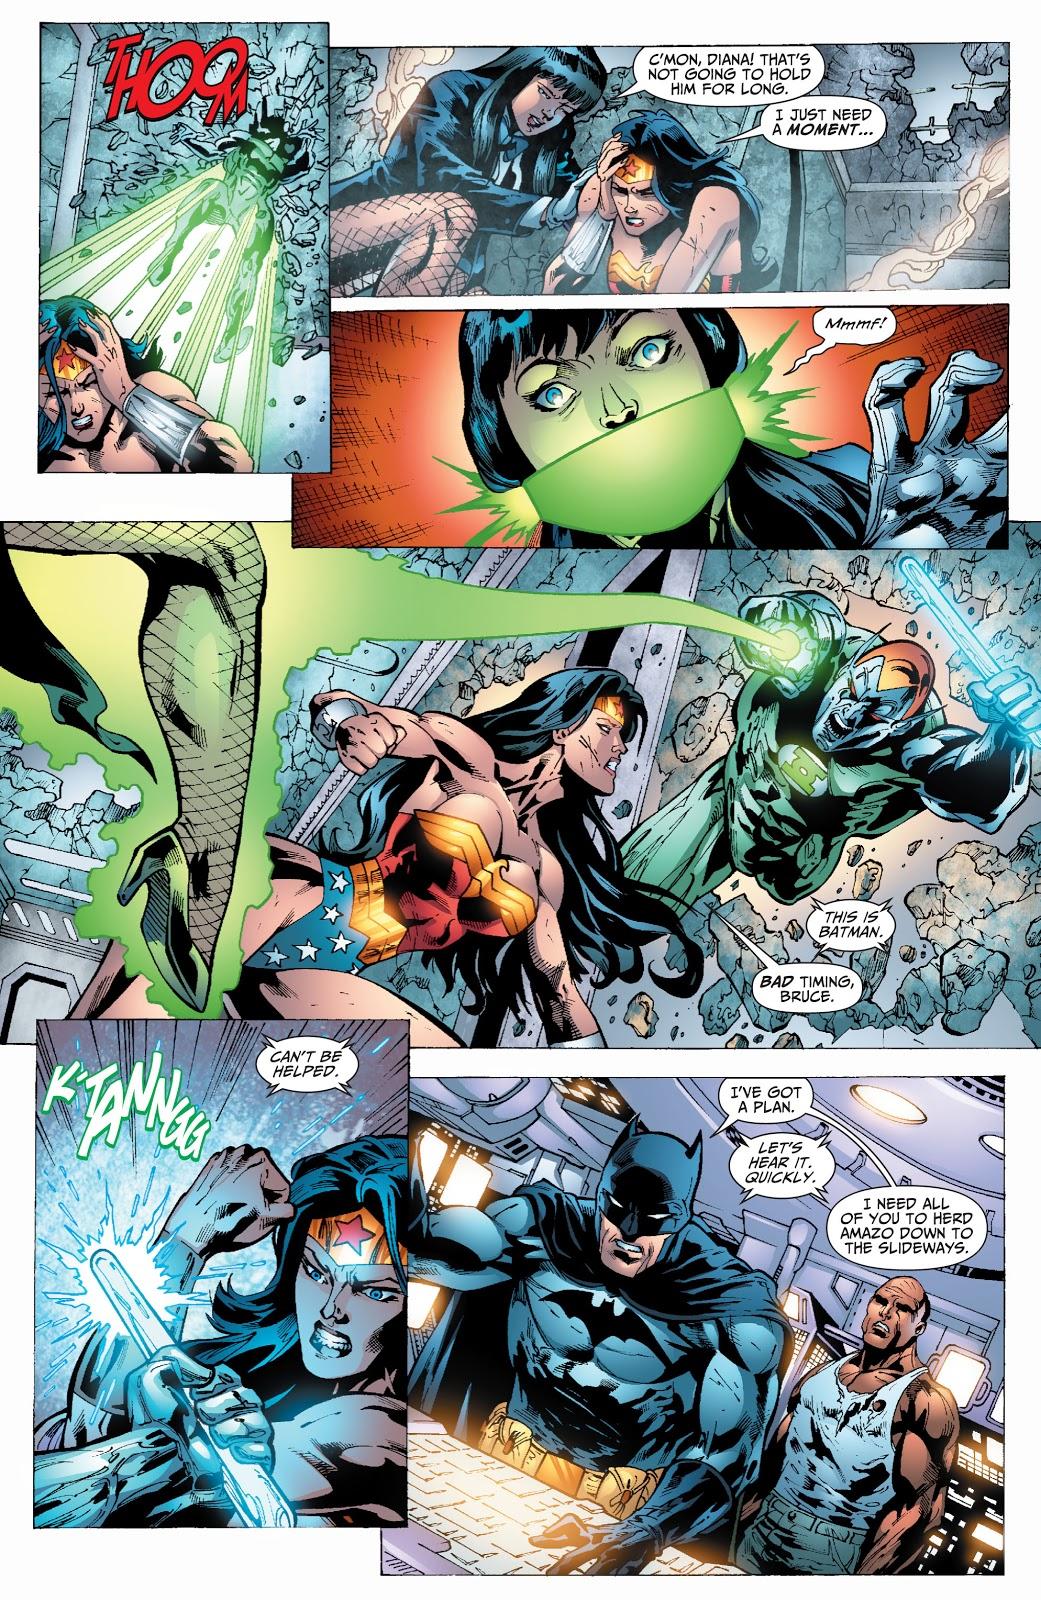 Wonder Woman VS Amazo (Justice League of America Vol. 2 #24)